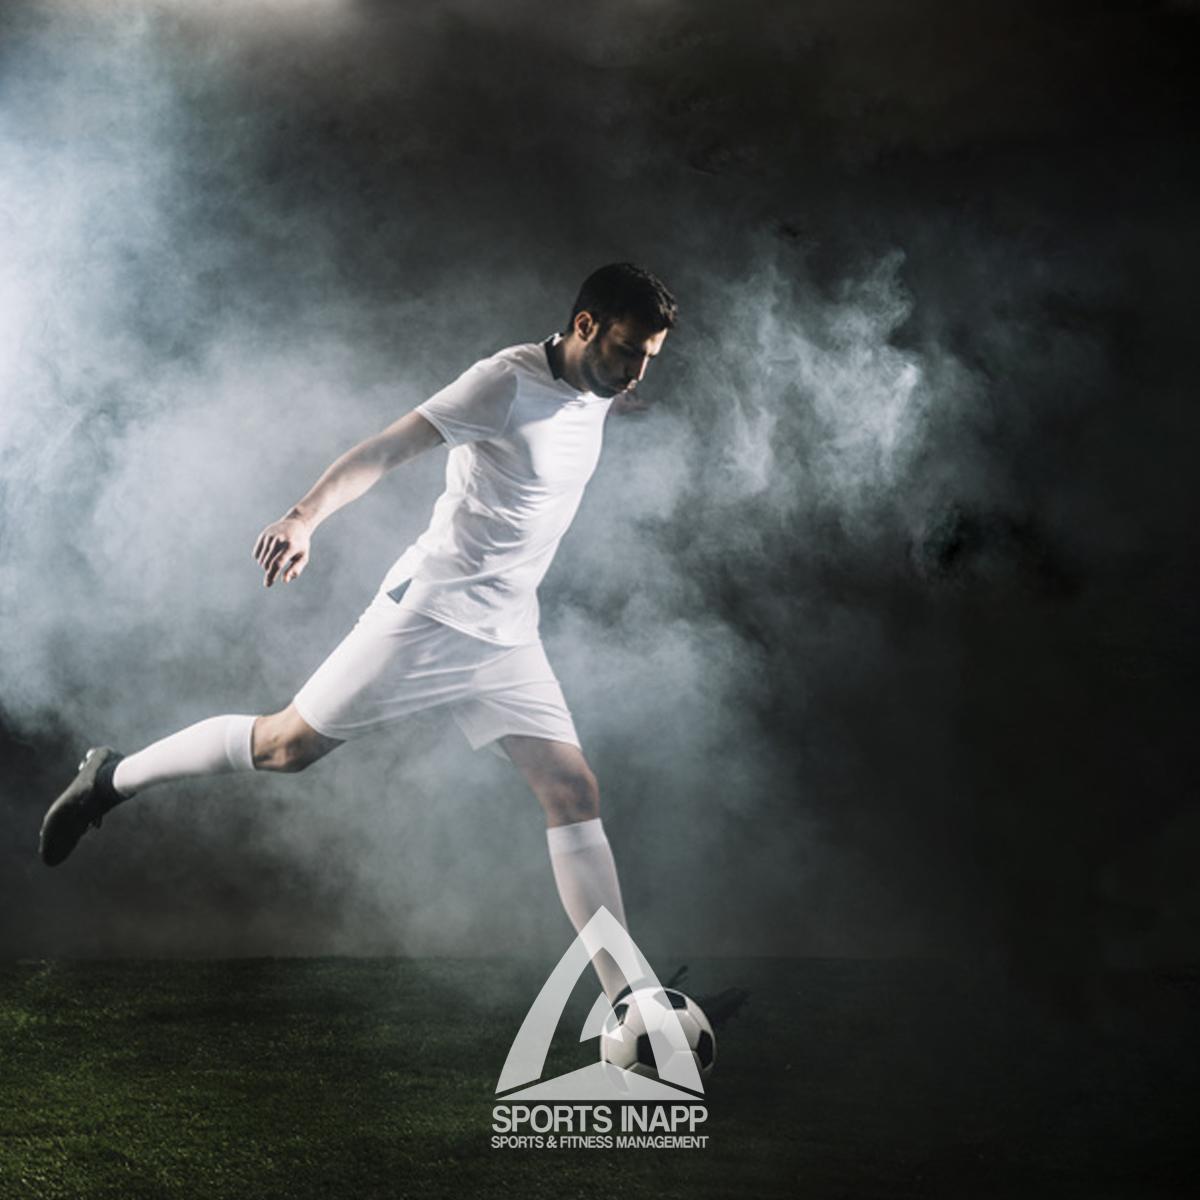 Sports In APP - Futebol